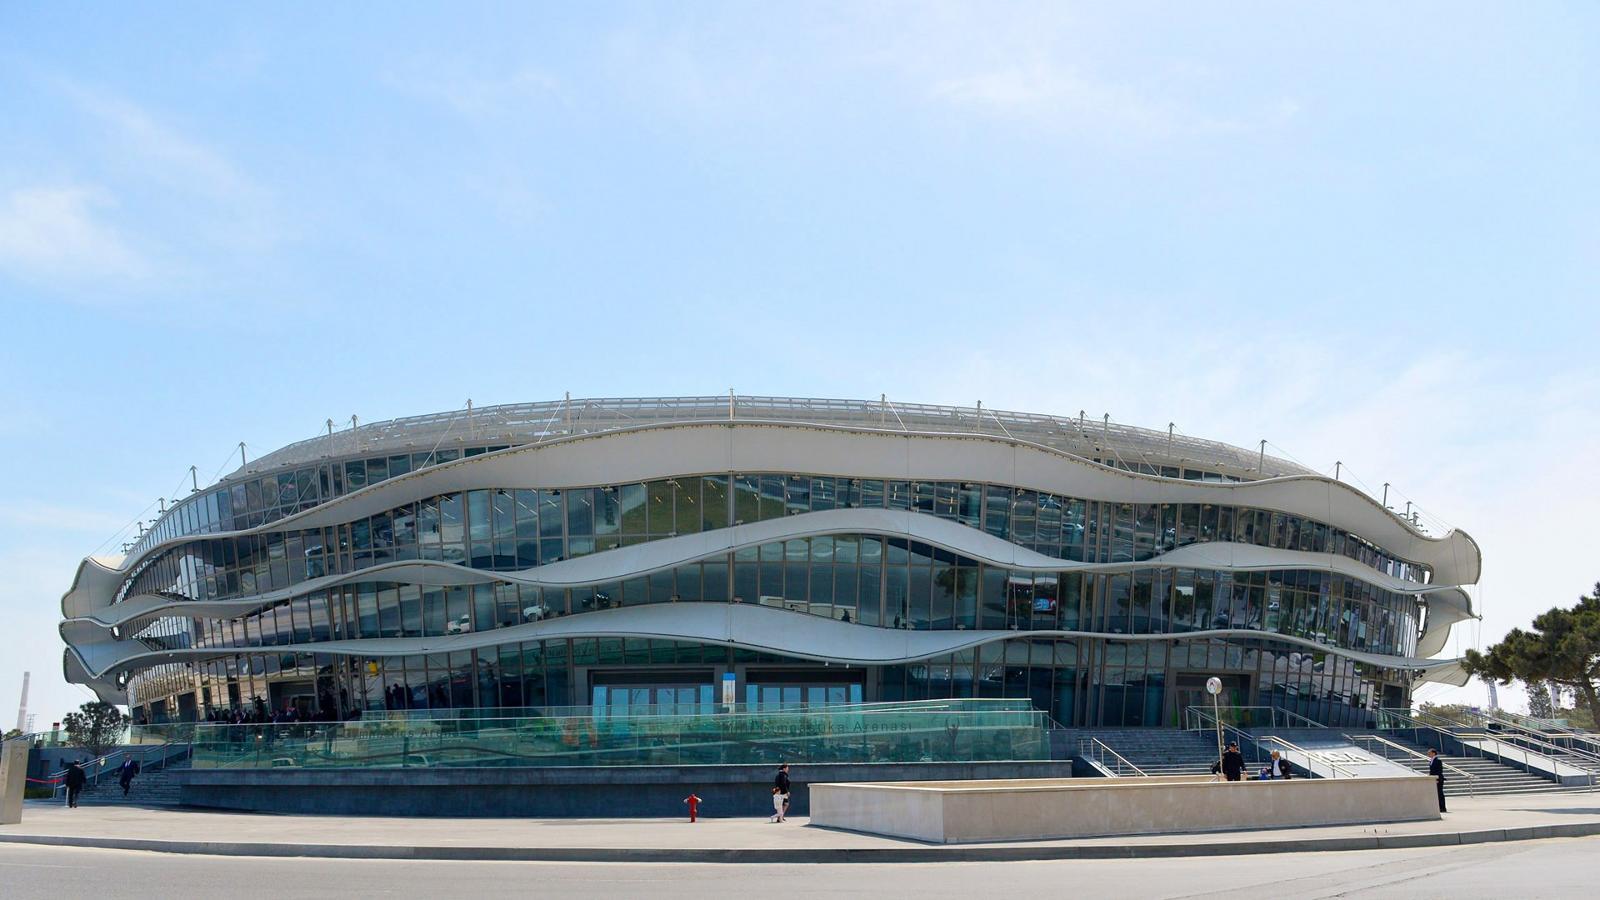 vجمهوری آذربایجان   Azerbaijan